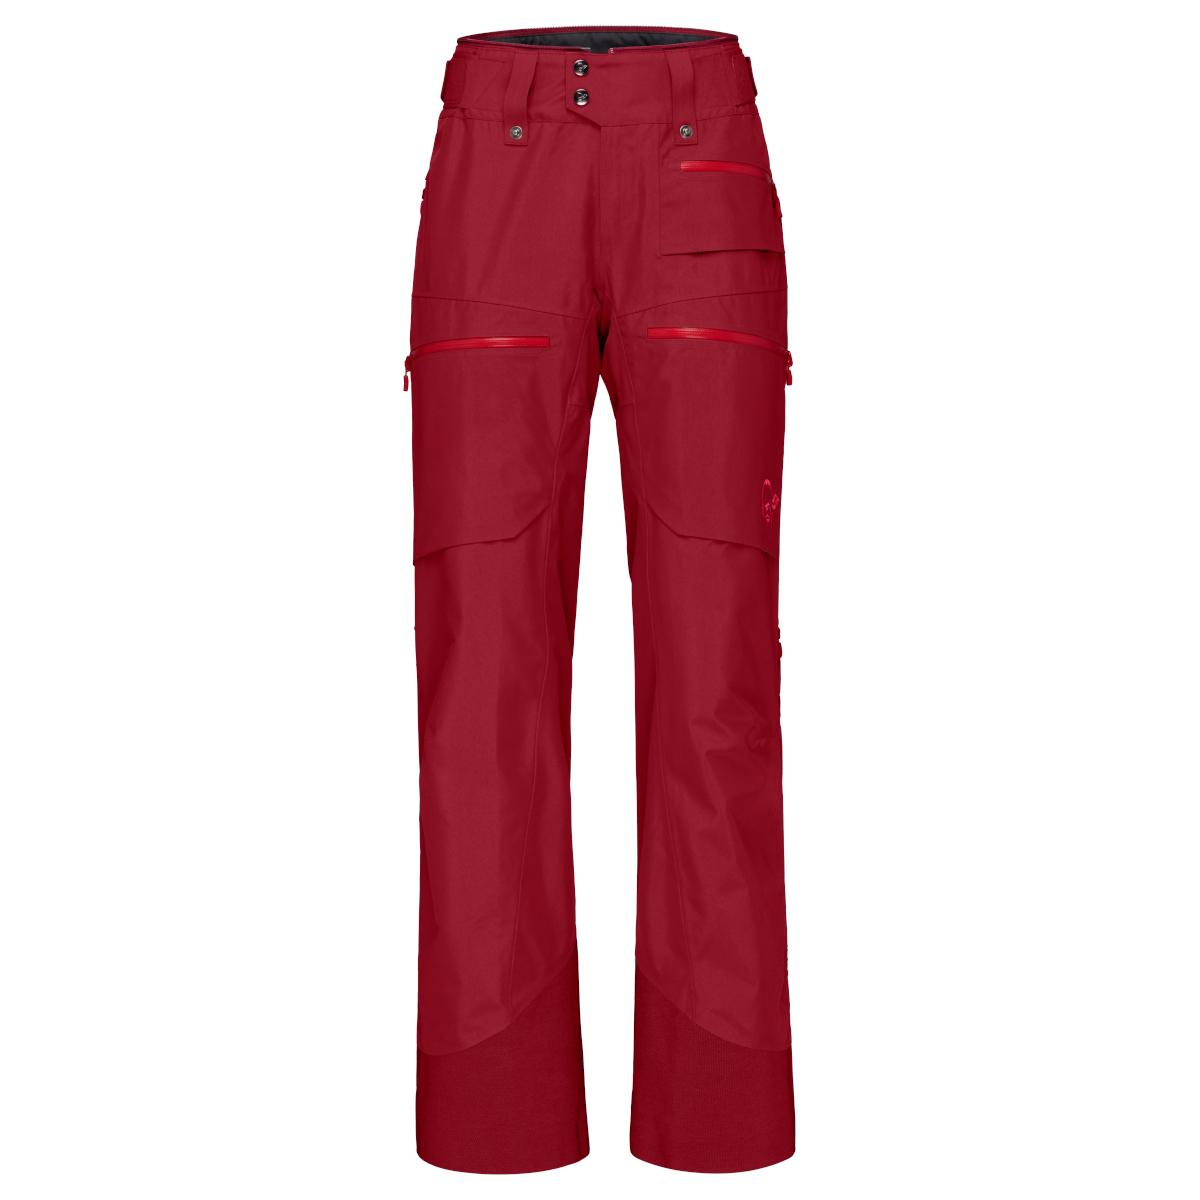 Norrona lofoten Gore-Tex insulated Pants Women - Rhubarb